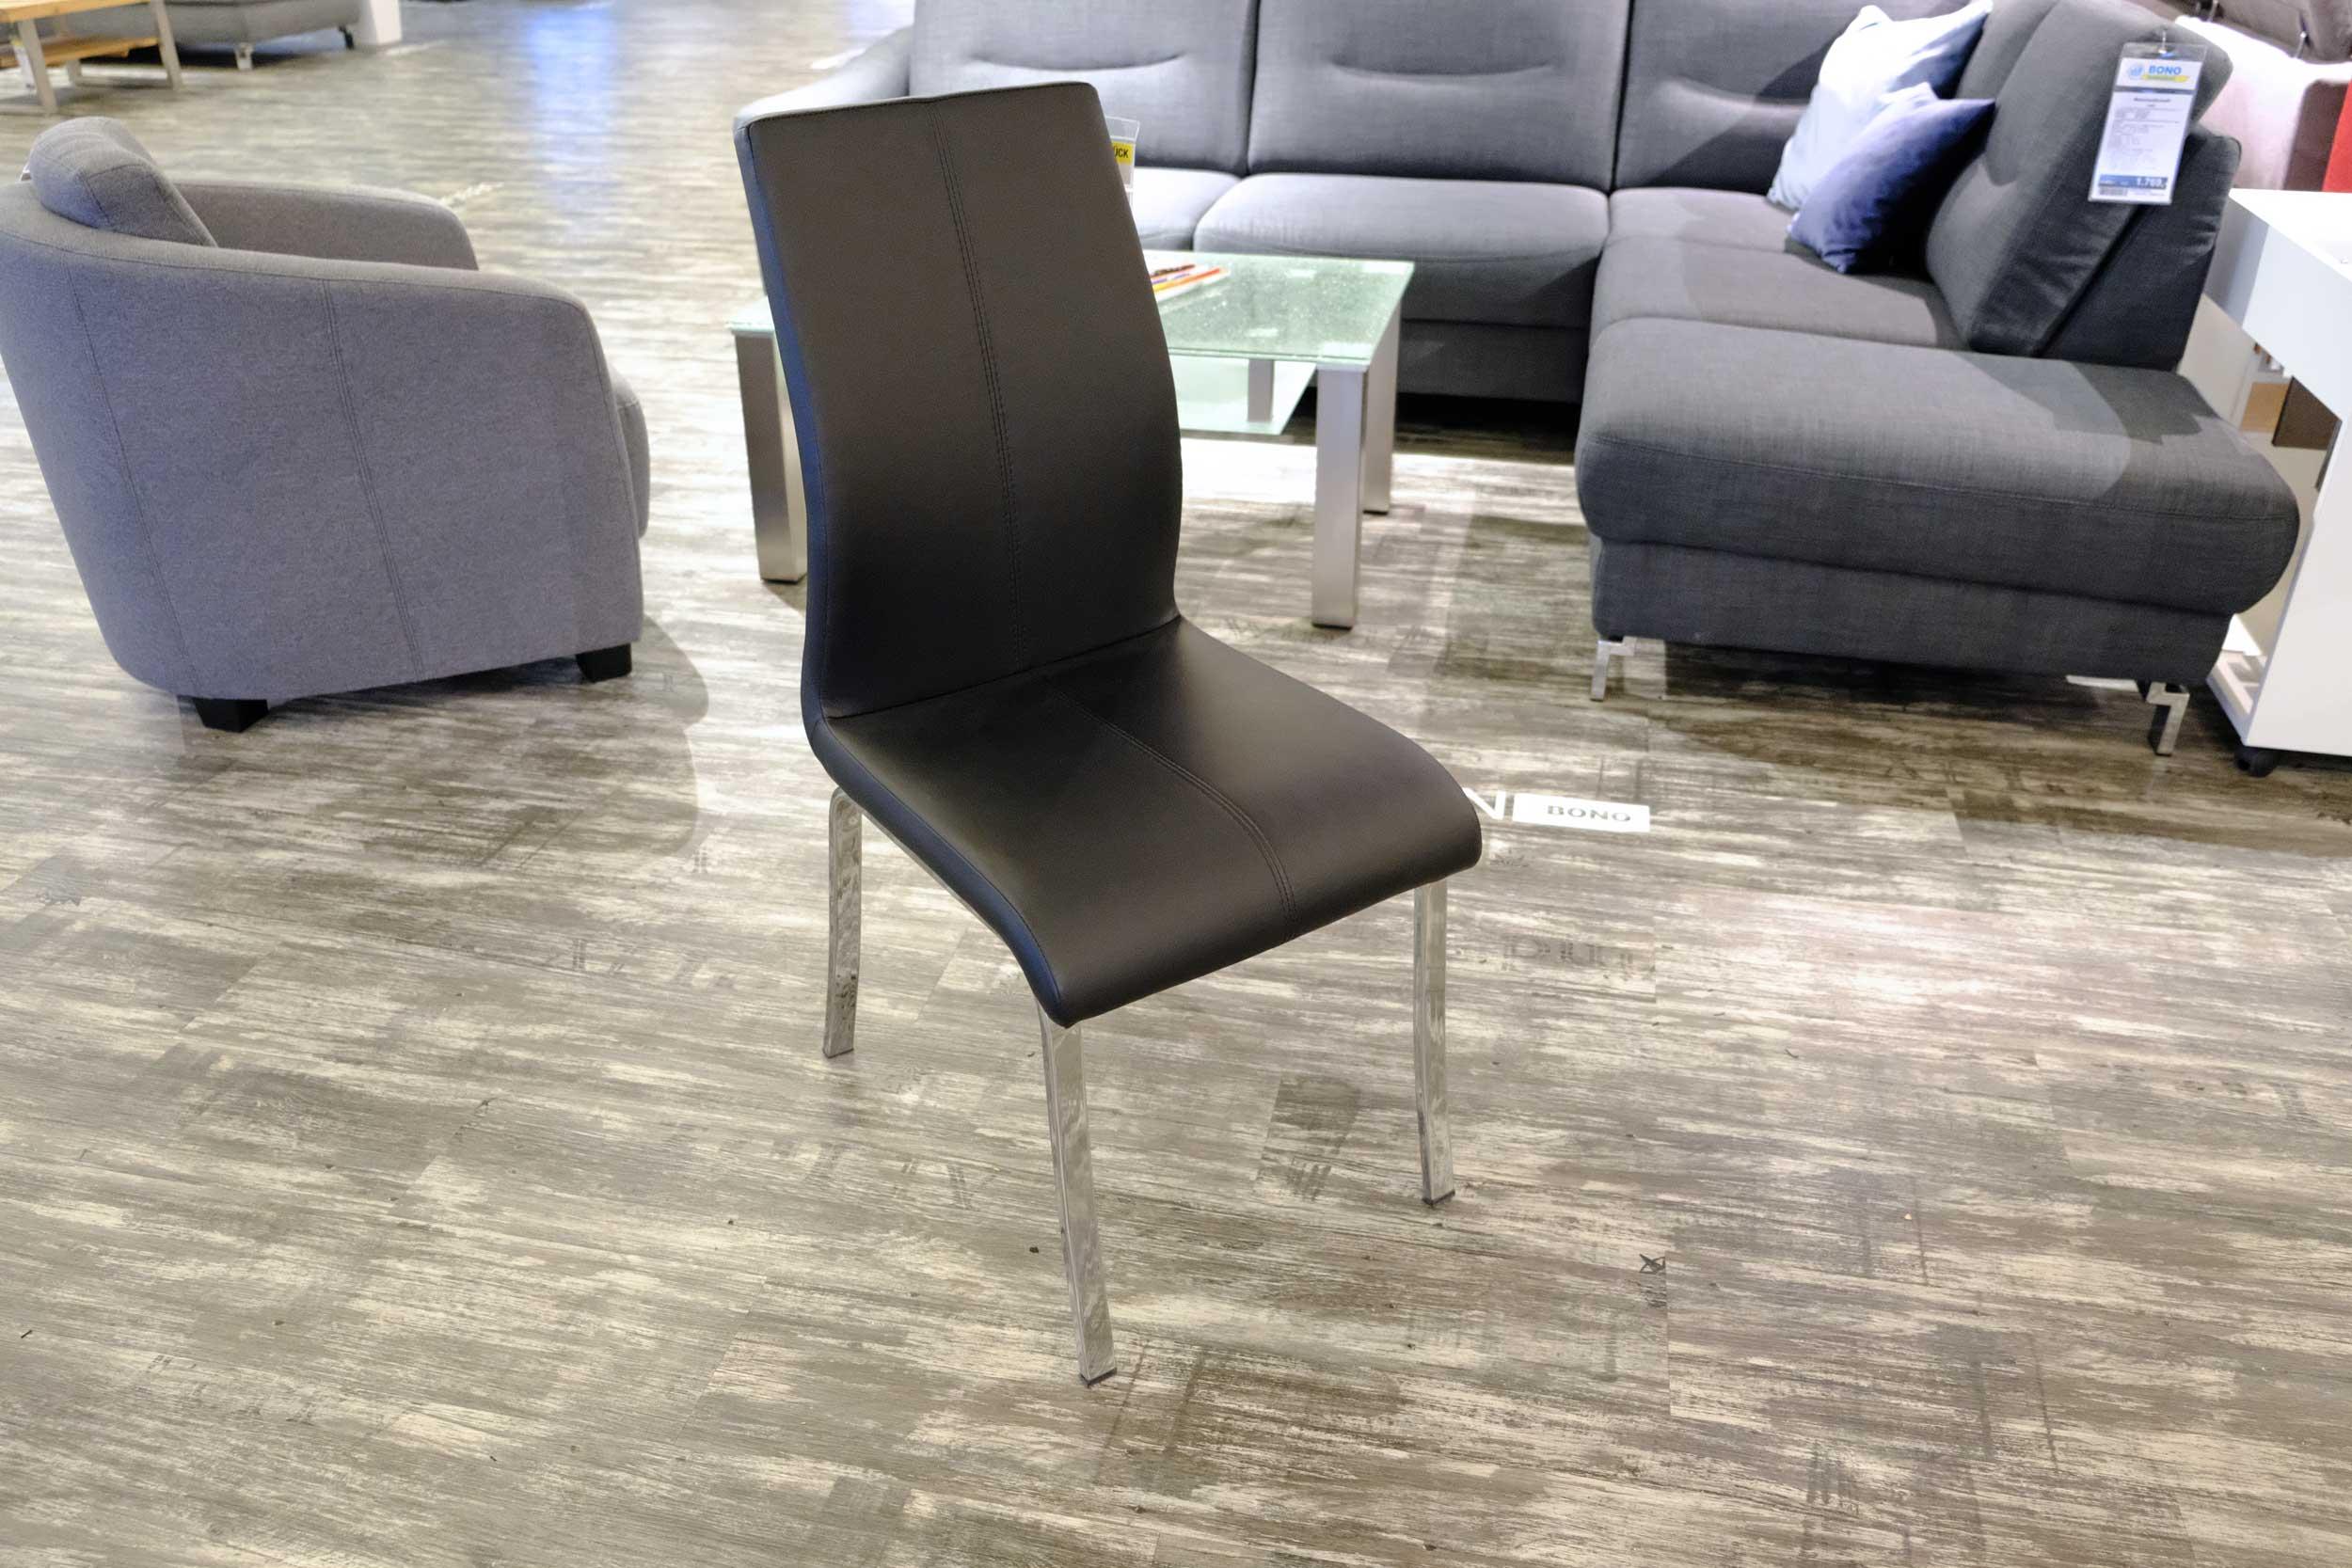 4-Fuß-Stuhl Schwarz CASADA